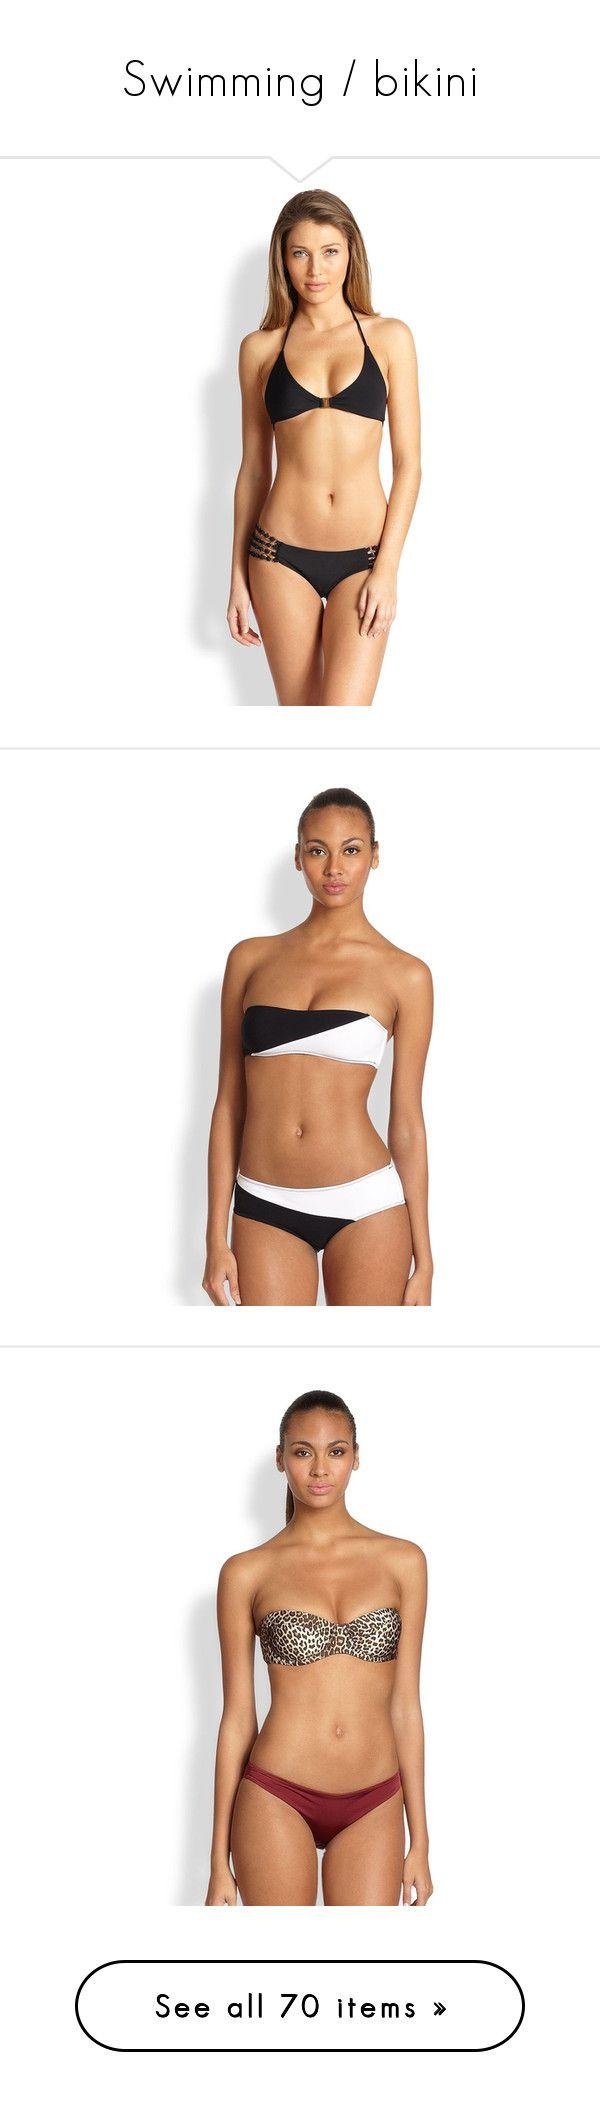 """Swimming / bikini"" by ceciliajoly-1 ❤ liked on Polyvore featuring swimwear, bikinis, bikini tops, apparel & accessories, black, chain bikinis, gold bikini, gold chain bikini, anchor bikini and halter neck bikini"